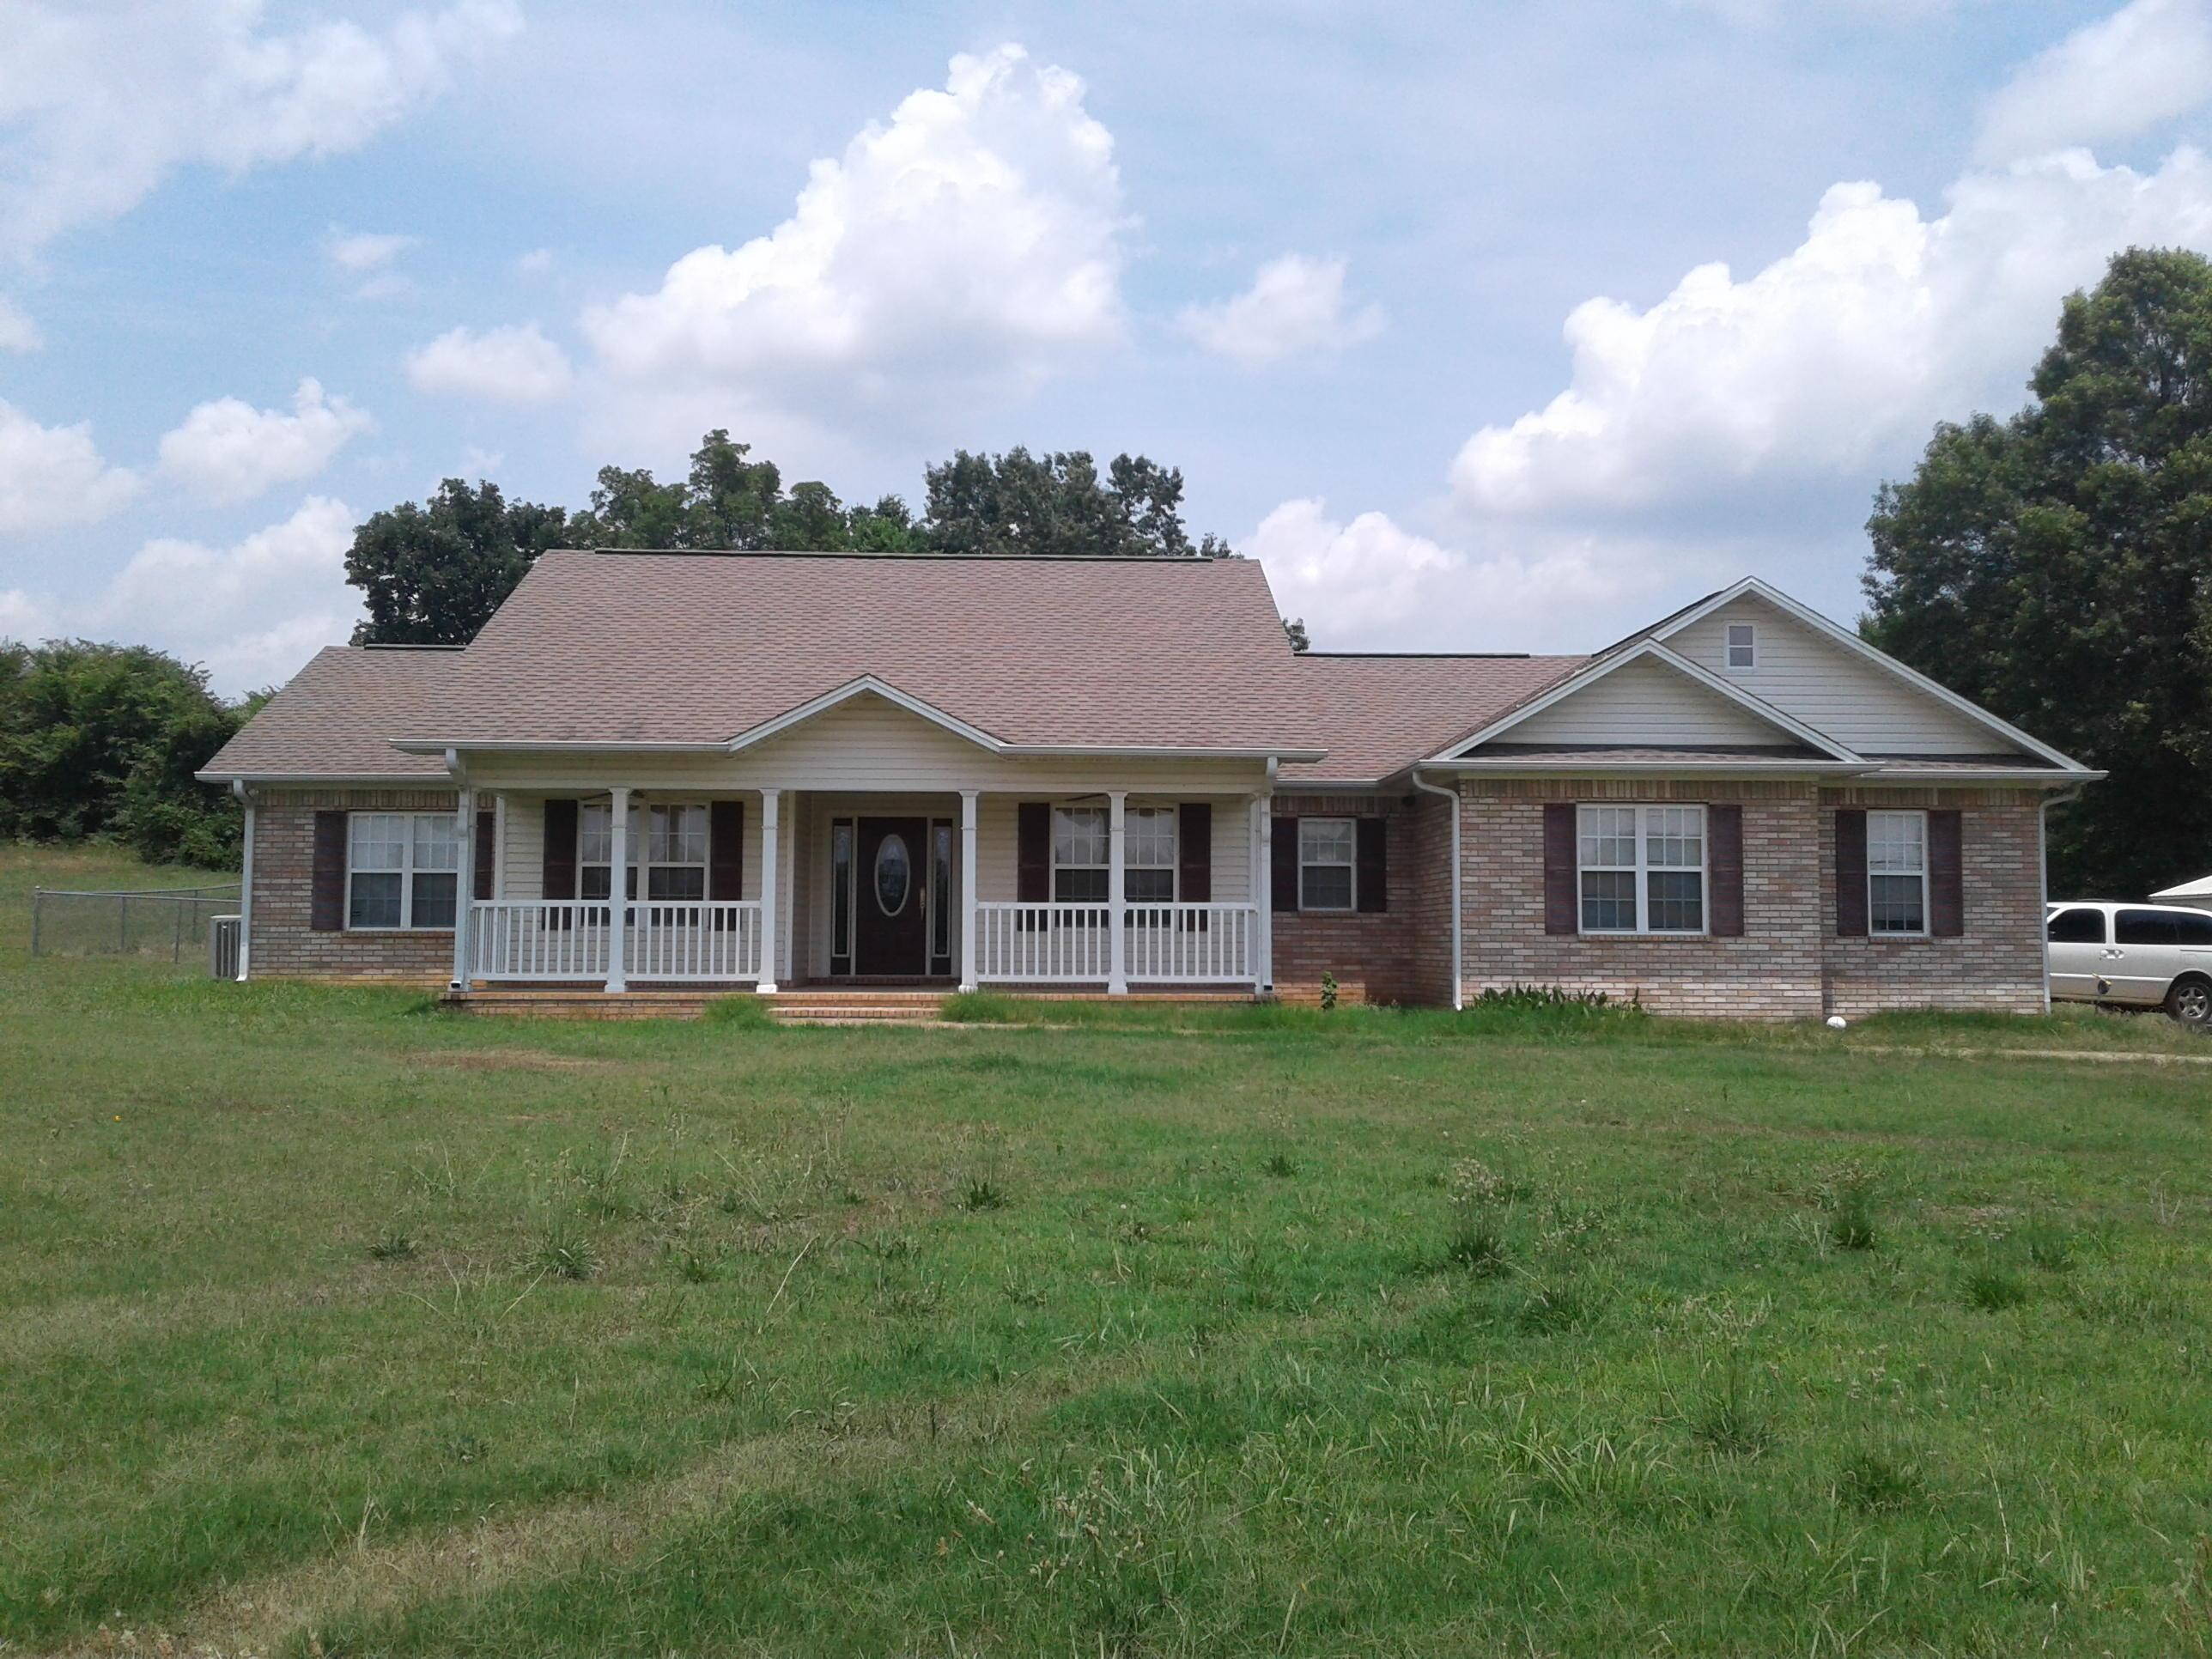 Main photo 2 of sold home in Hartman at 8380  Hwy 64 , Hartman, AR 72840